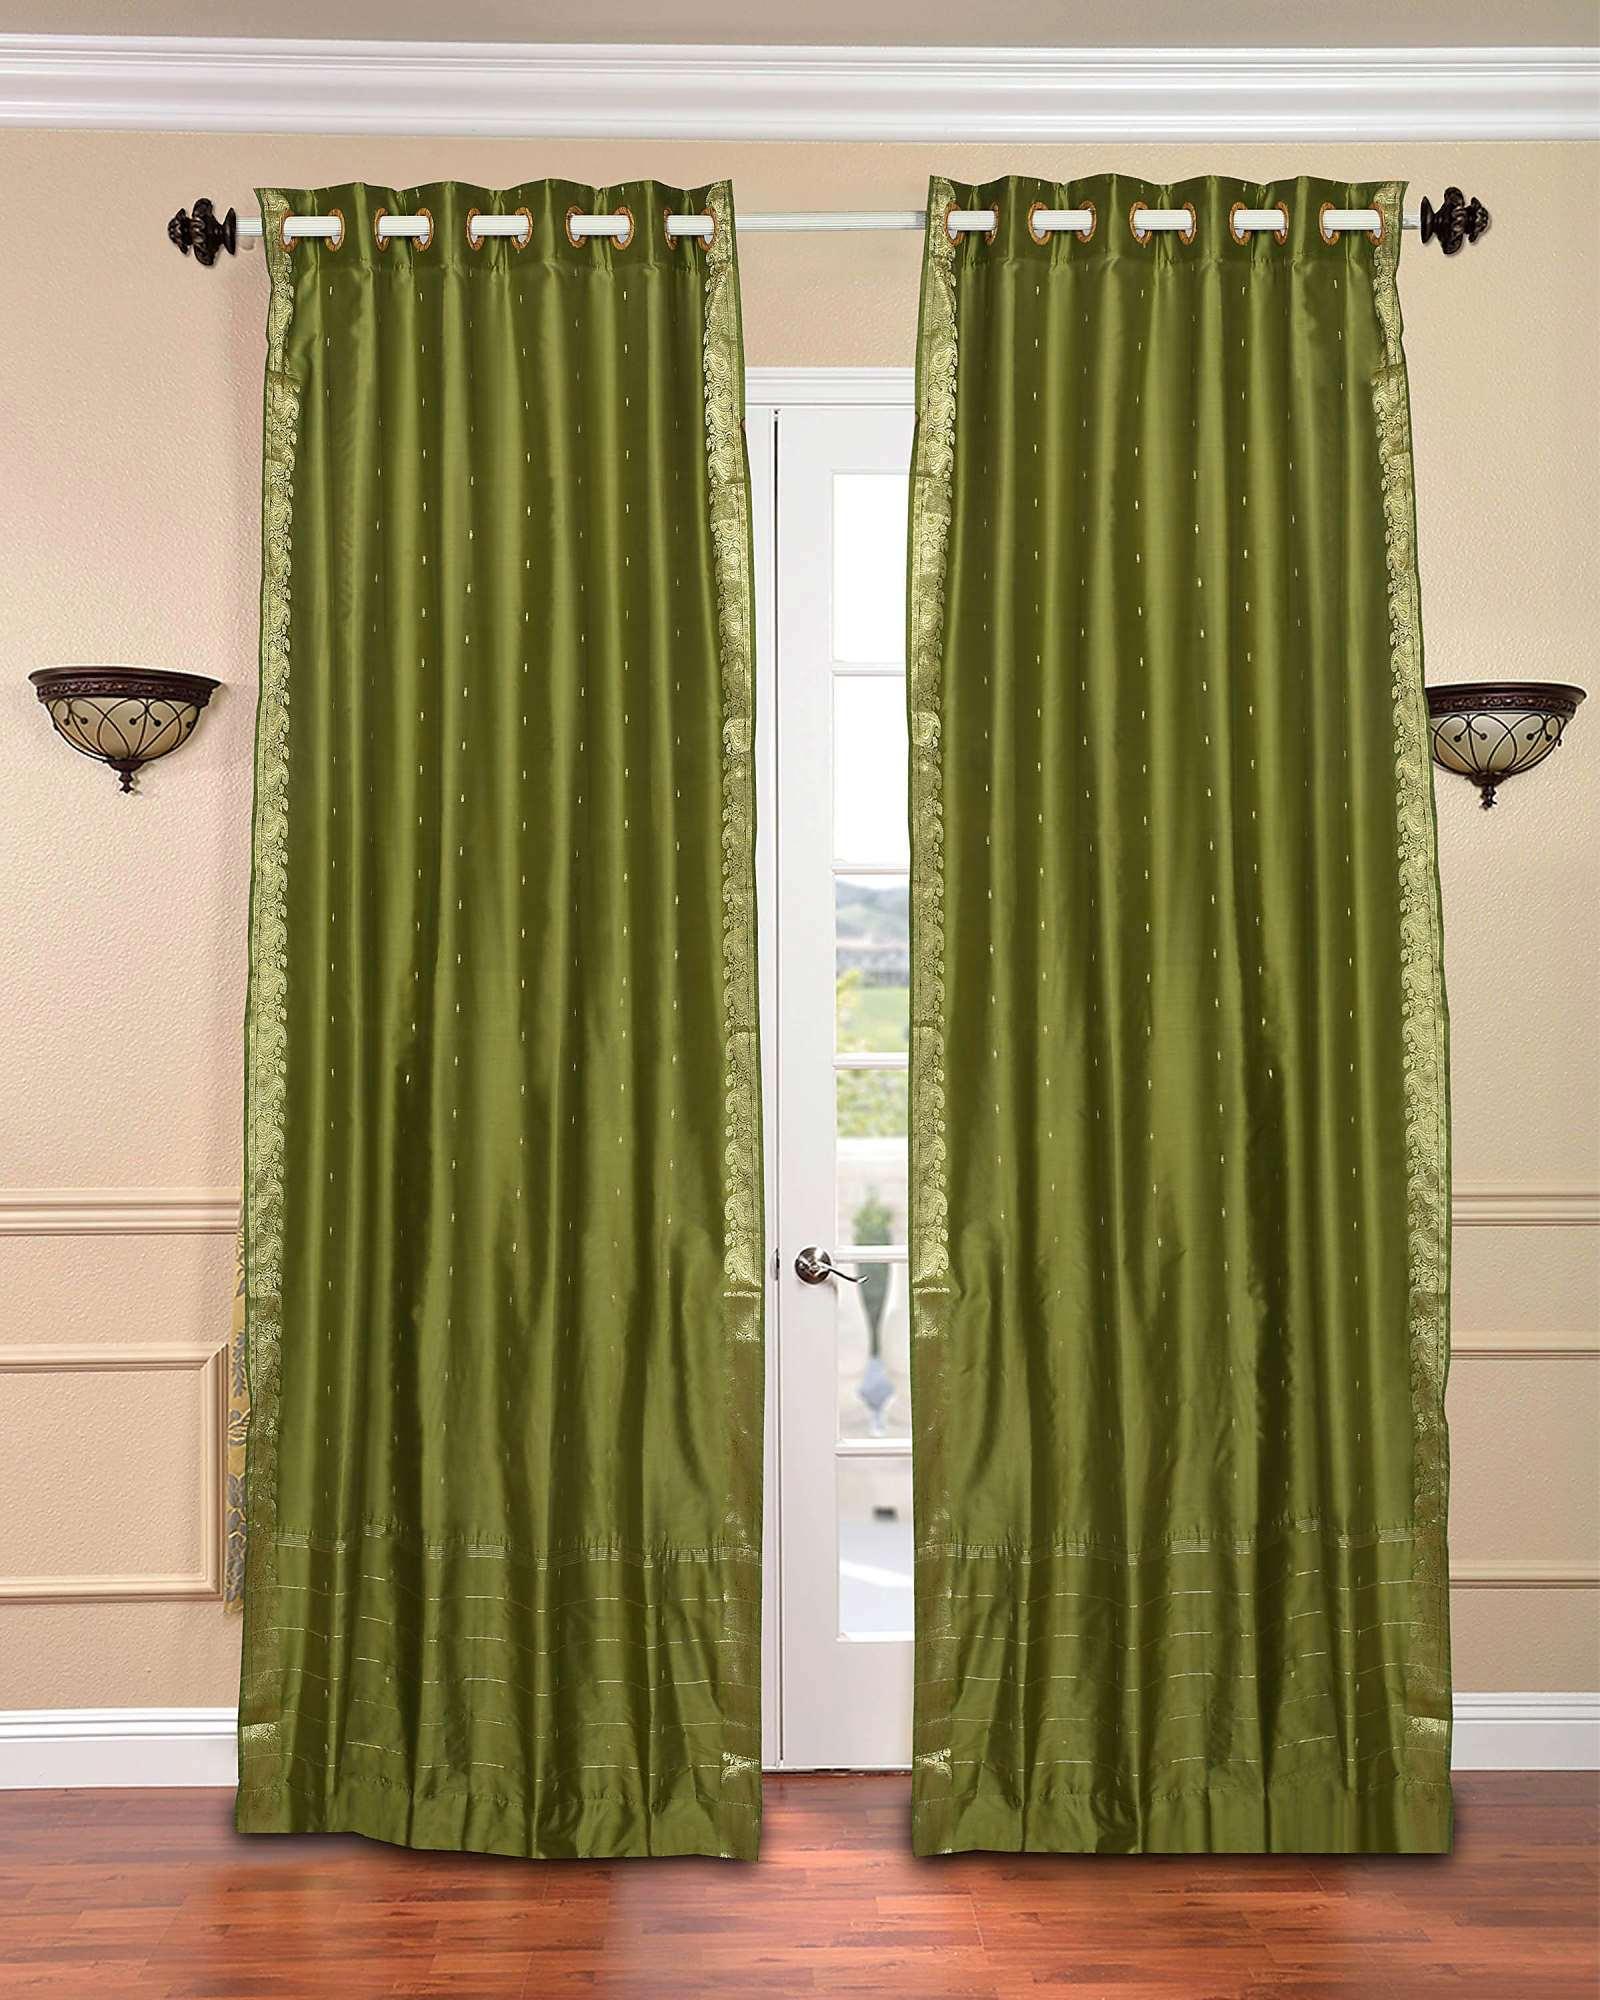 Olive Green Ring Top Sheer Sari Curtain / Drape / Panel